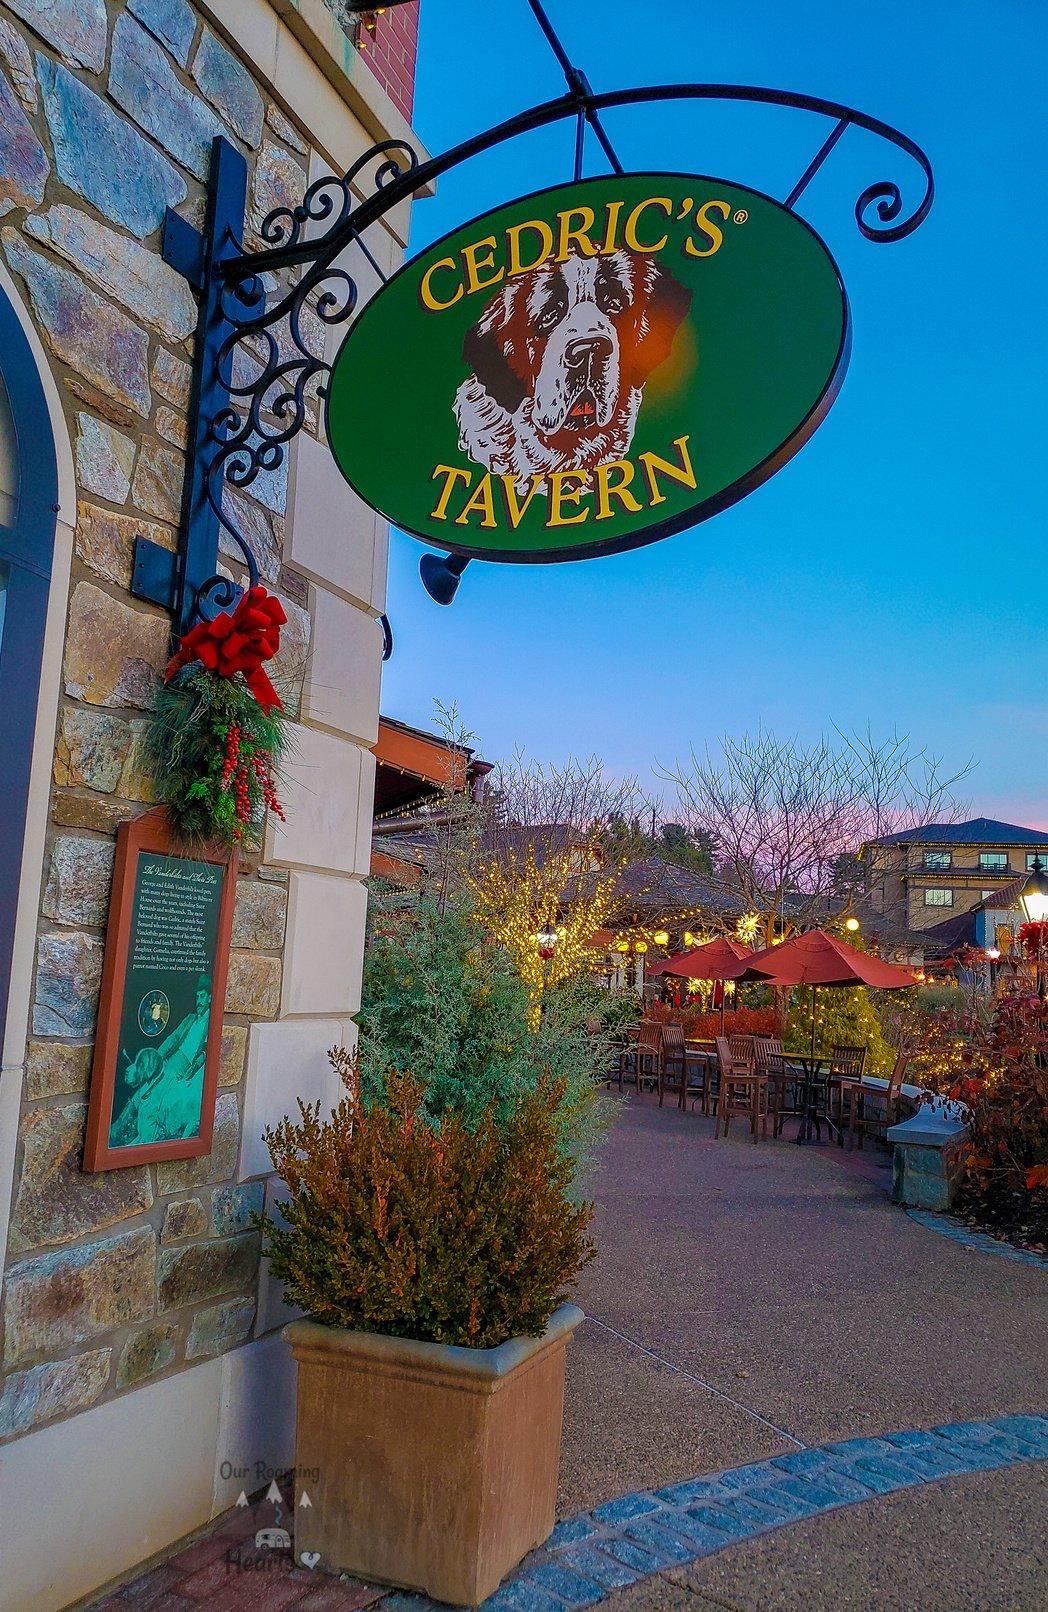 Cedric's Tavern - Biltmore - Ashville NC